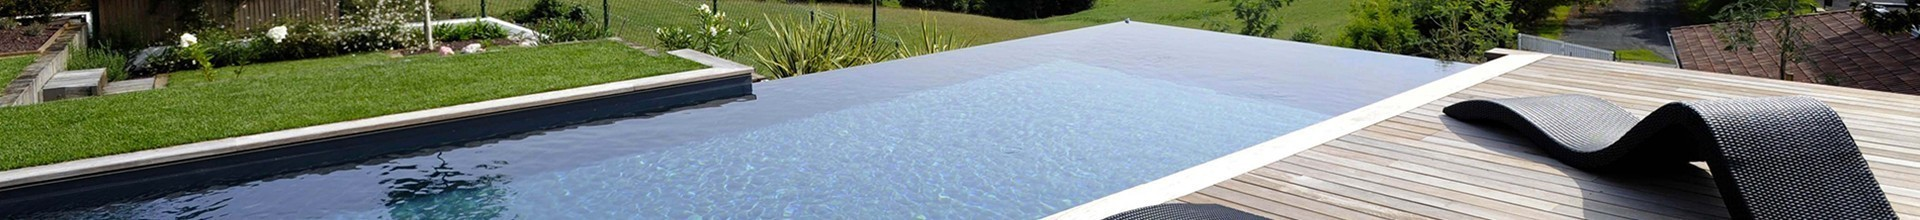 Direct usine, piscine coque prix Hauts-Seine